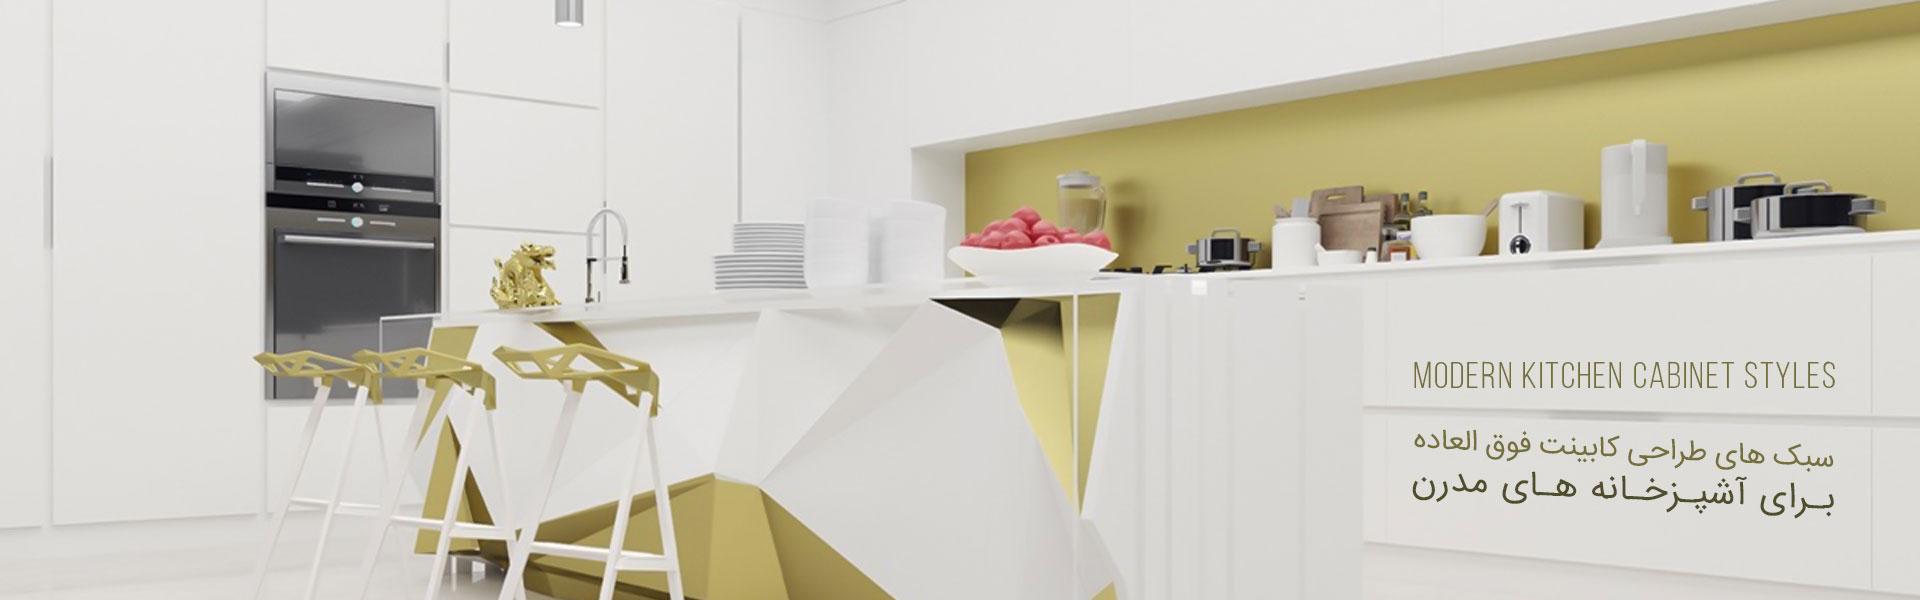 decorasion kabinet sabk2 - سبک های طراحی کابینت فوق العاده برای آشپزخانه های مدرن